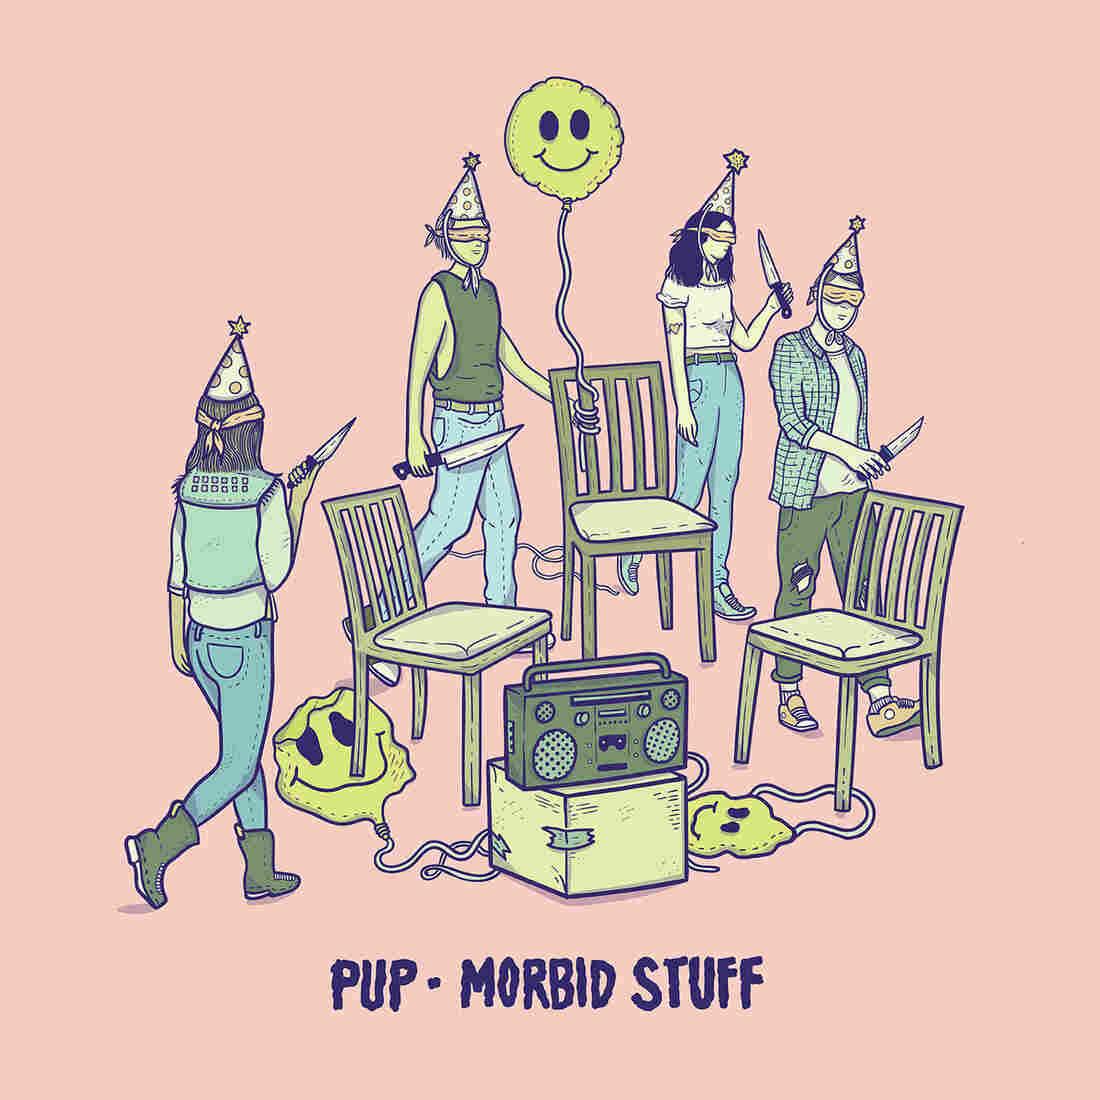 PUP, Morbid Stuff